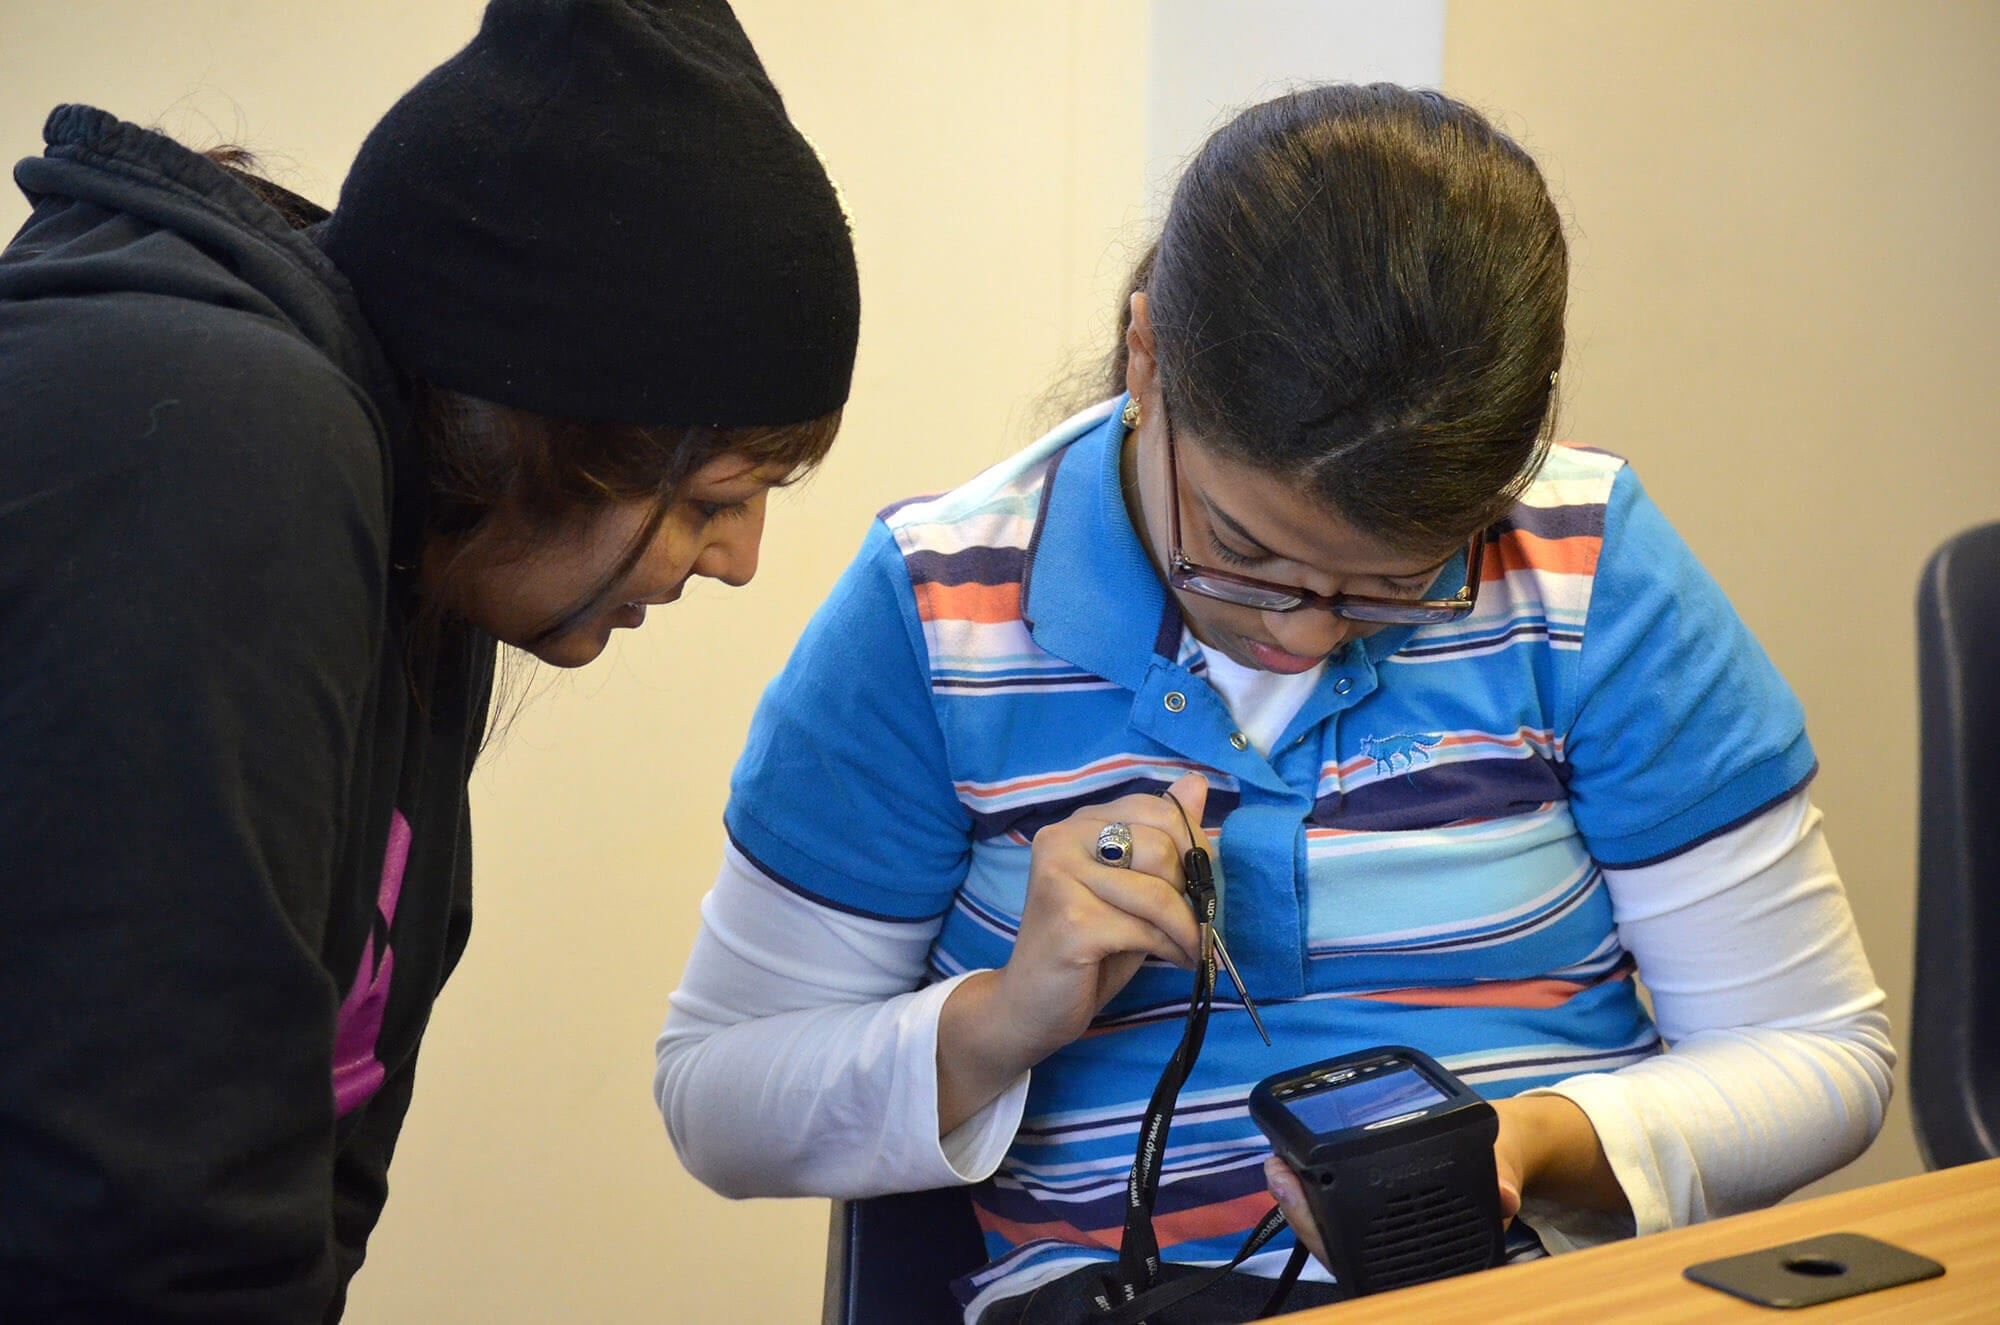 Technology Facilitating Communication